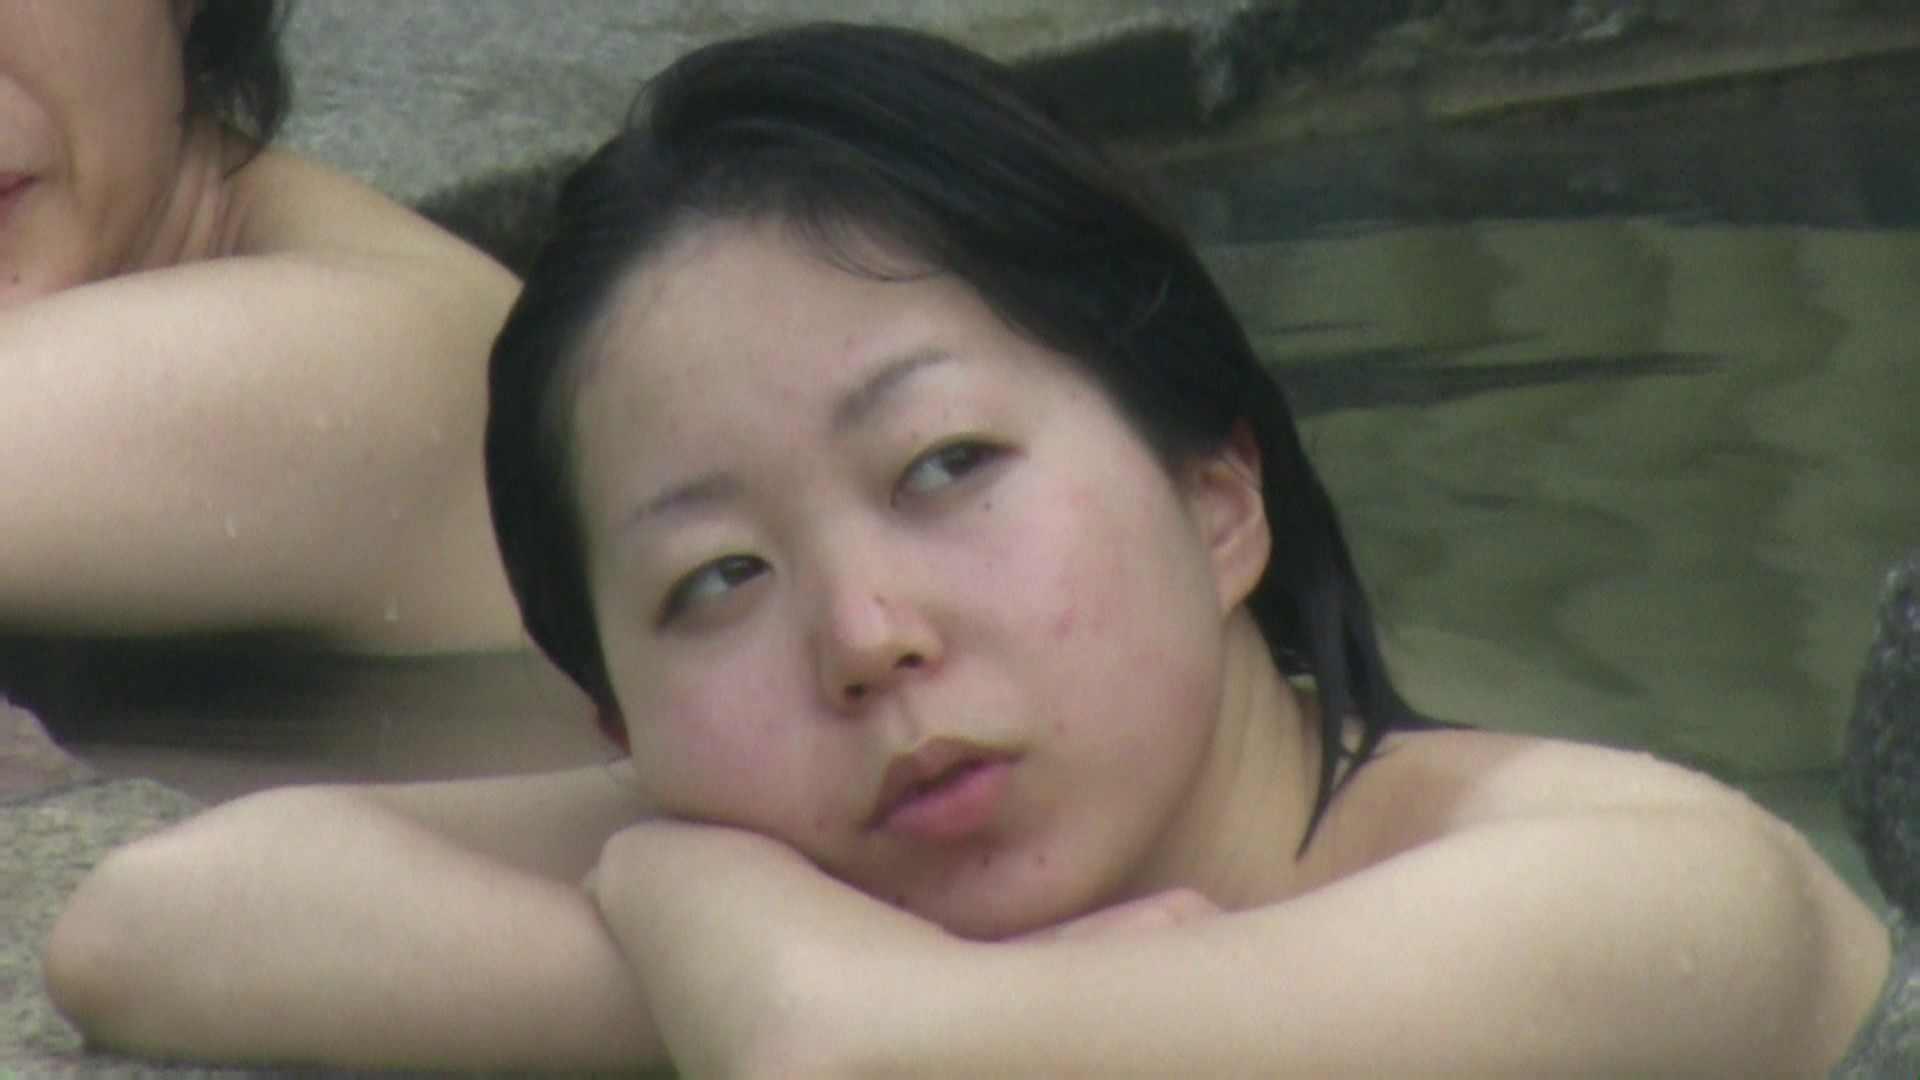 Aquaな露天風呂Vol.06【VIP】 盗撮 | OLエロ画像  113PICs 34